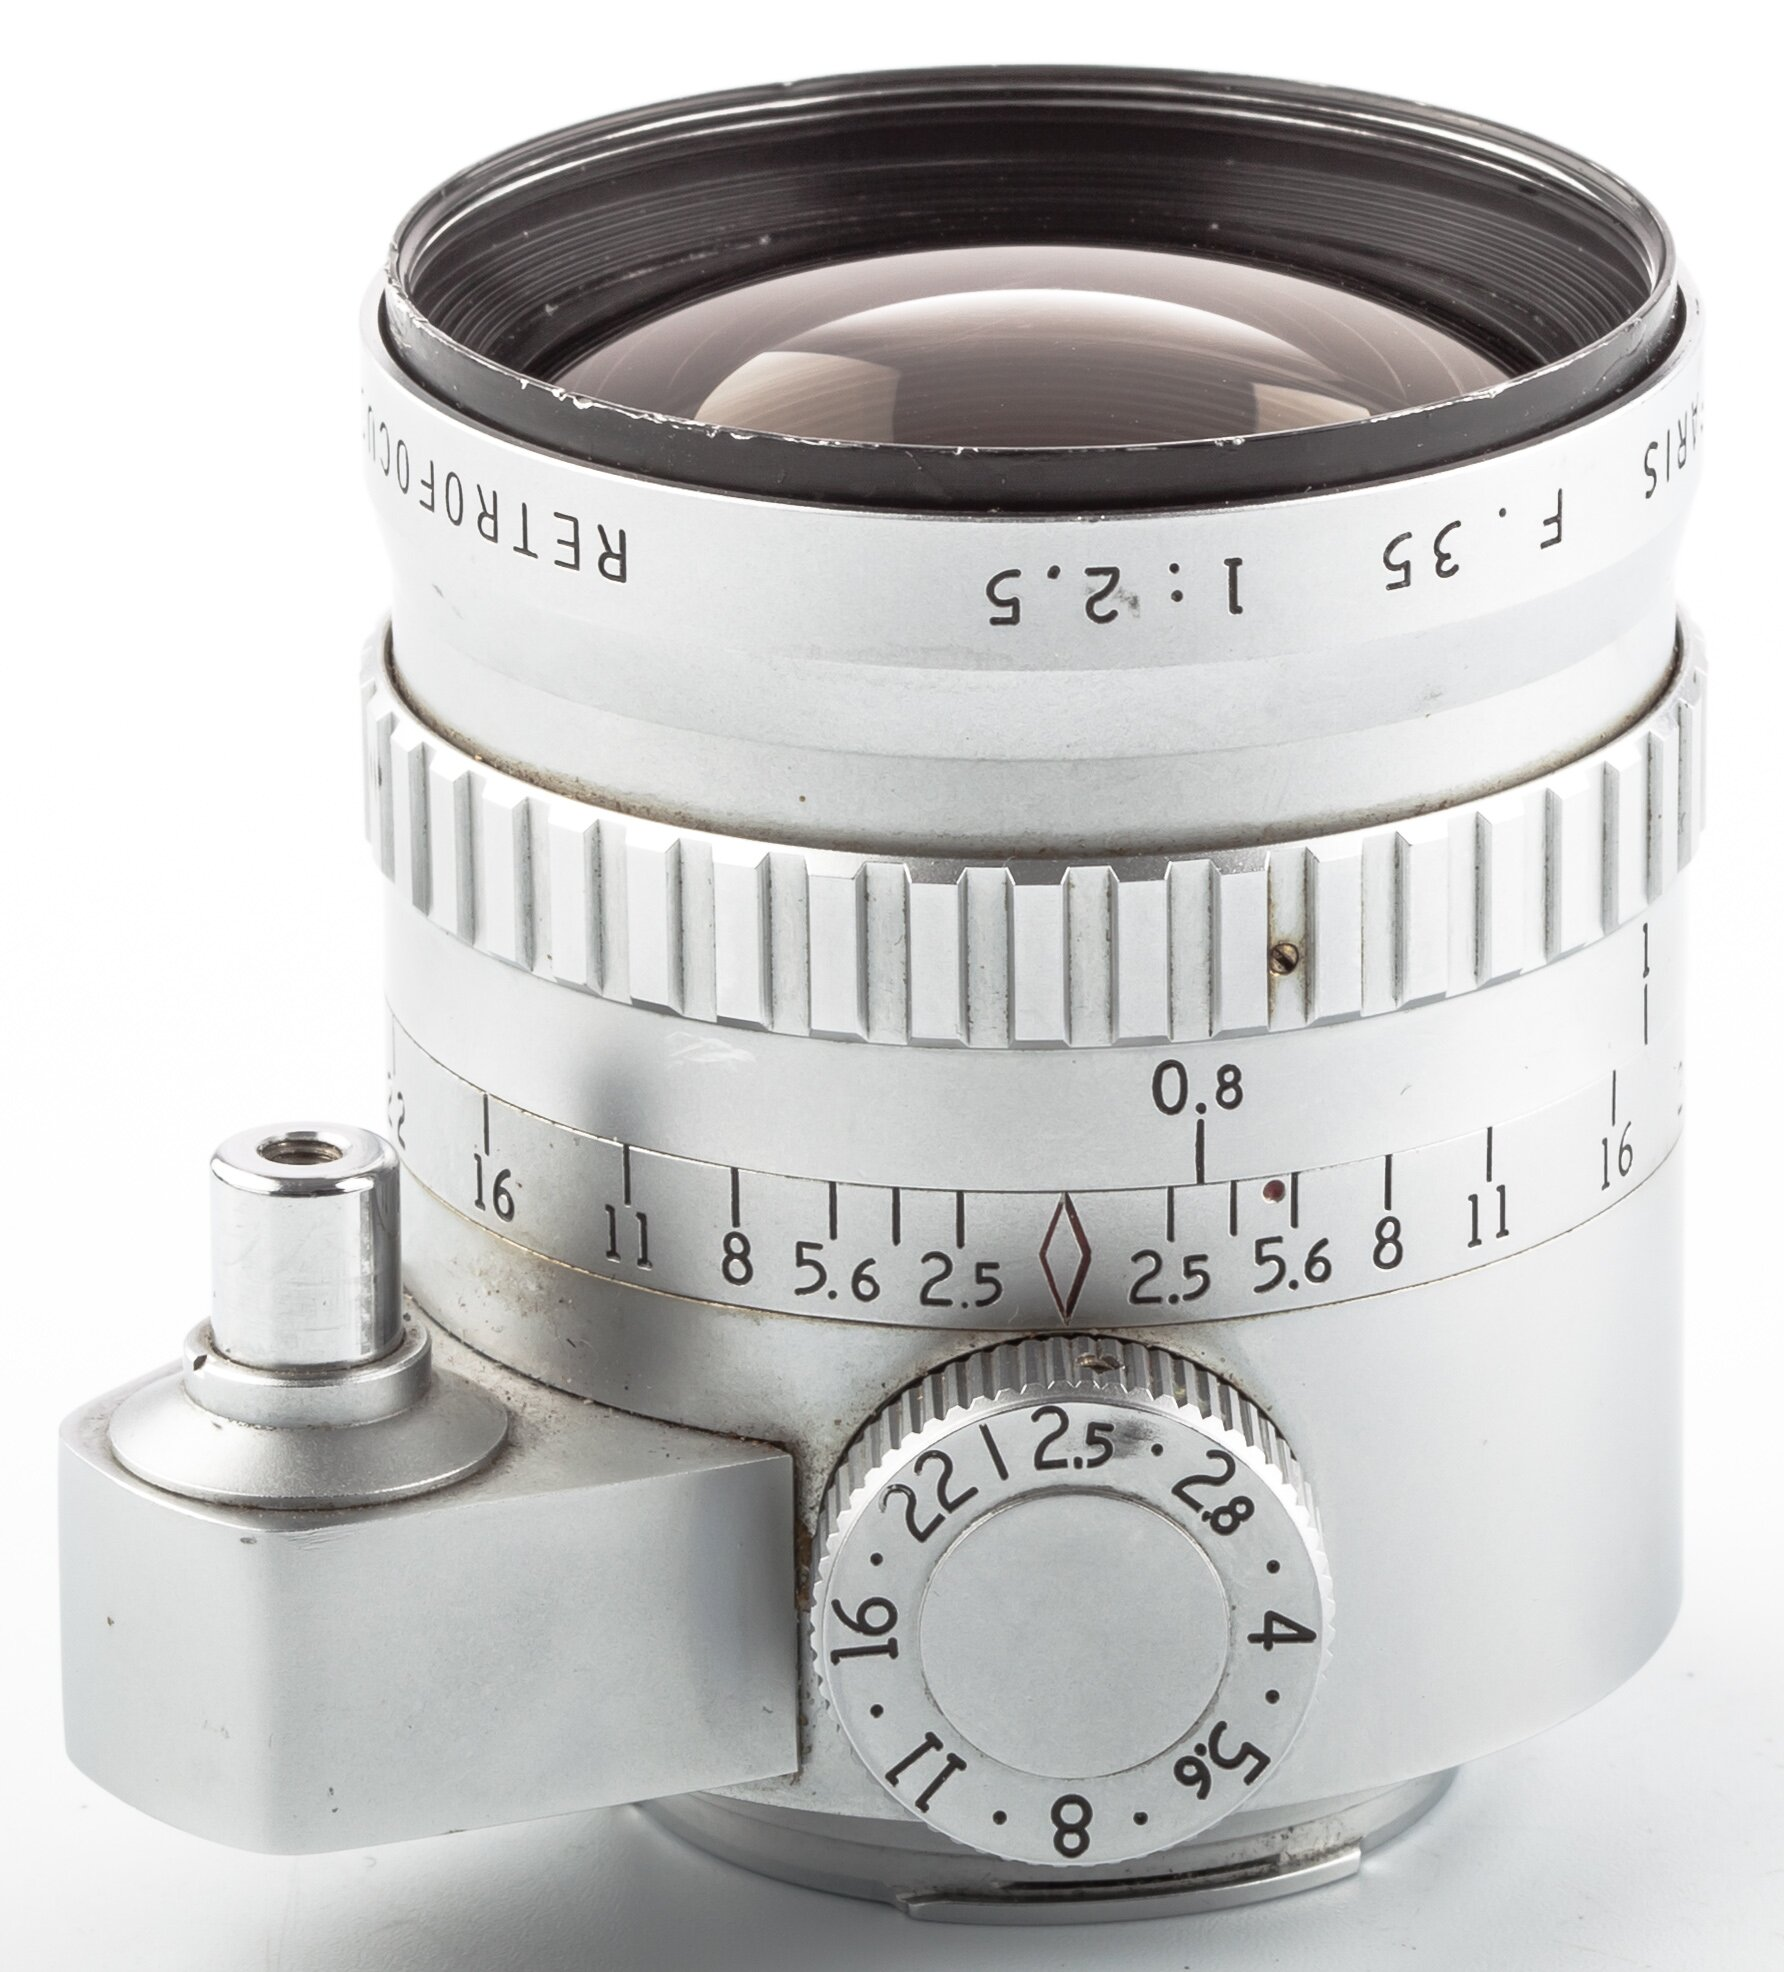 Angenieux 35mm 2,5 Retrofocus Type R1 Exakta